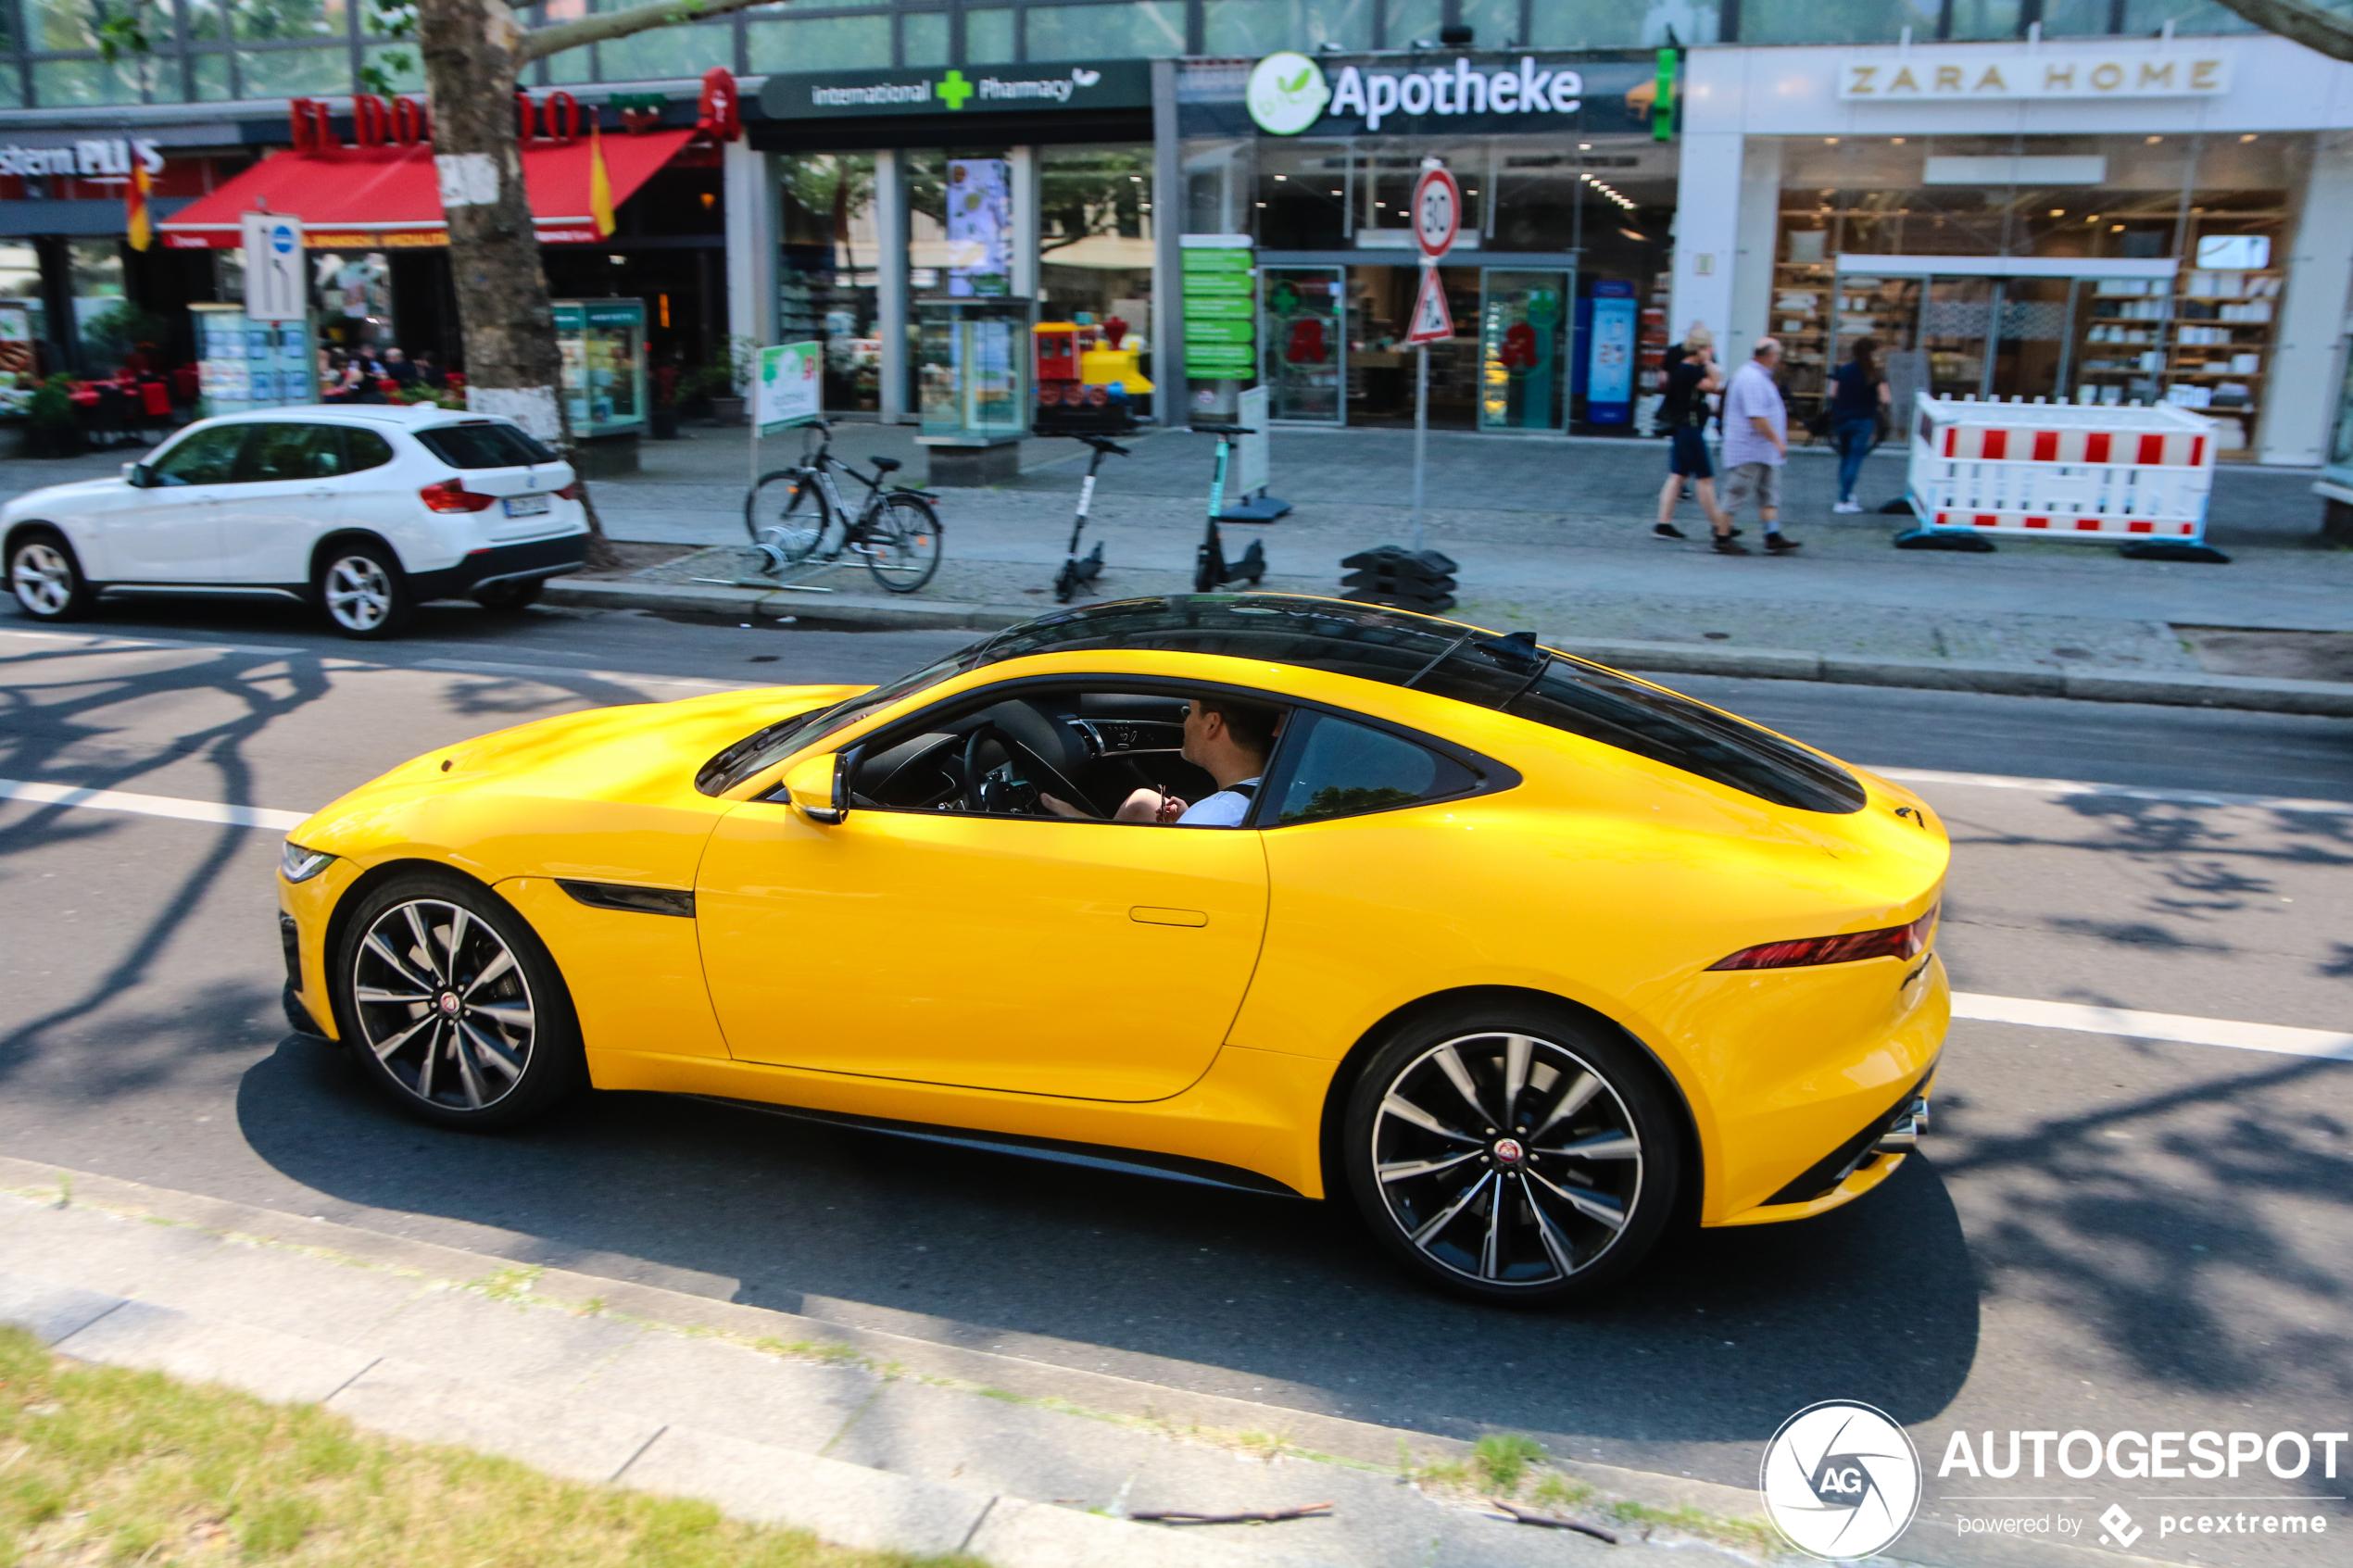 Jaguar F-TYPE R Coupé 2020 - 13 juni 2020 - Autogespot